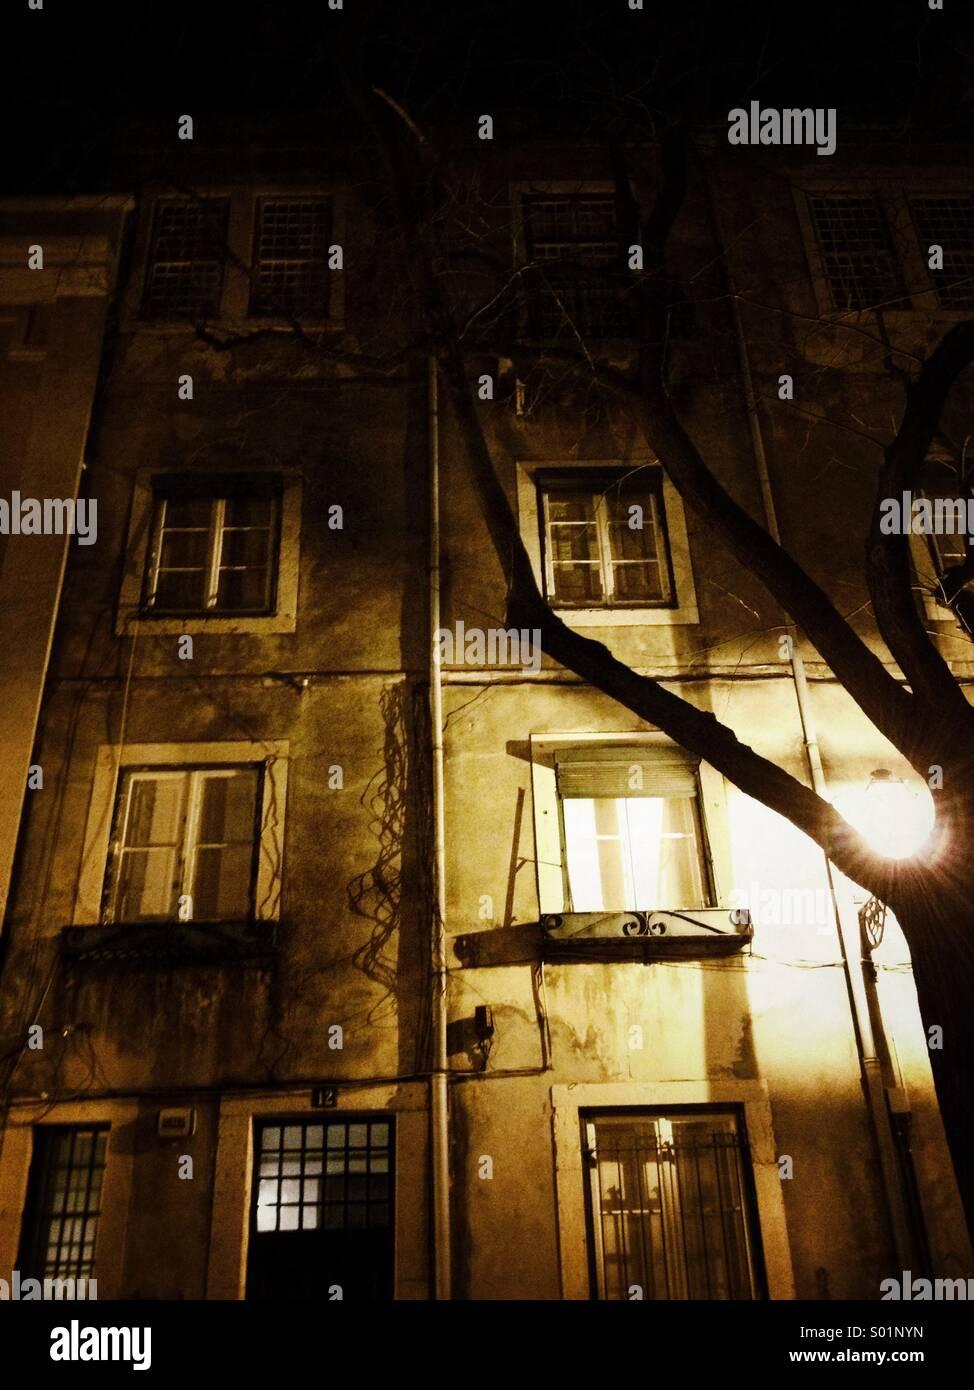 Tall building at night, Lisbon - Stock Image